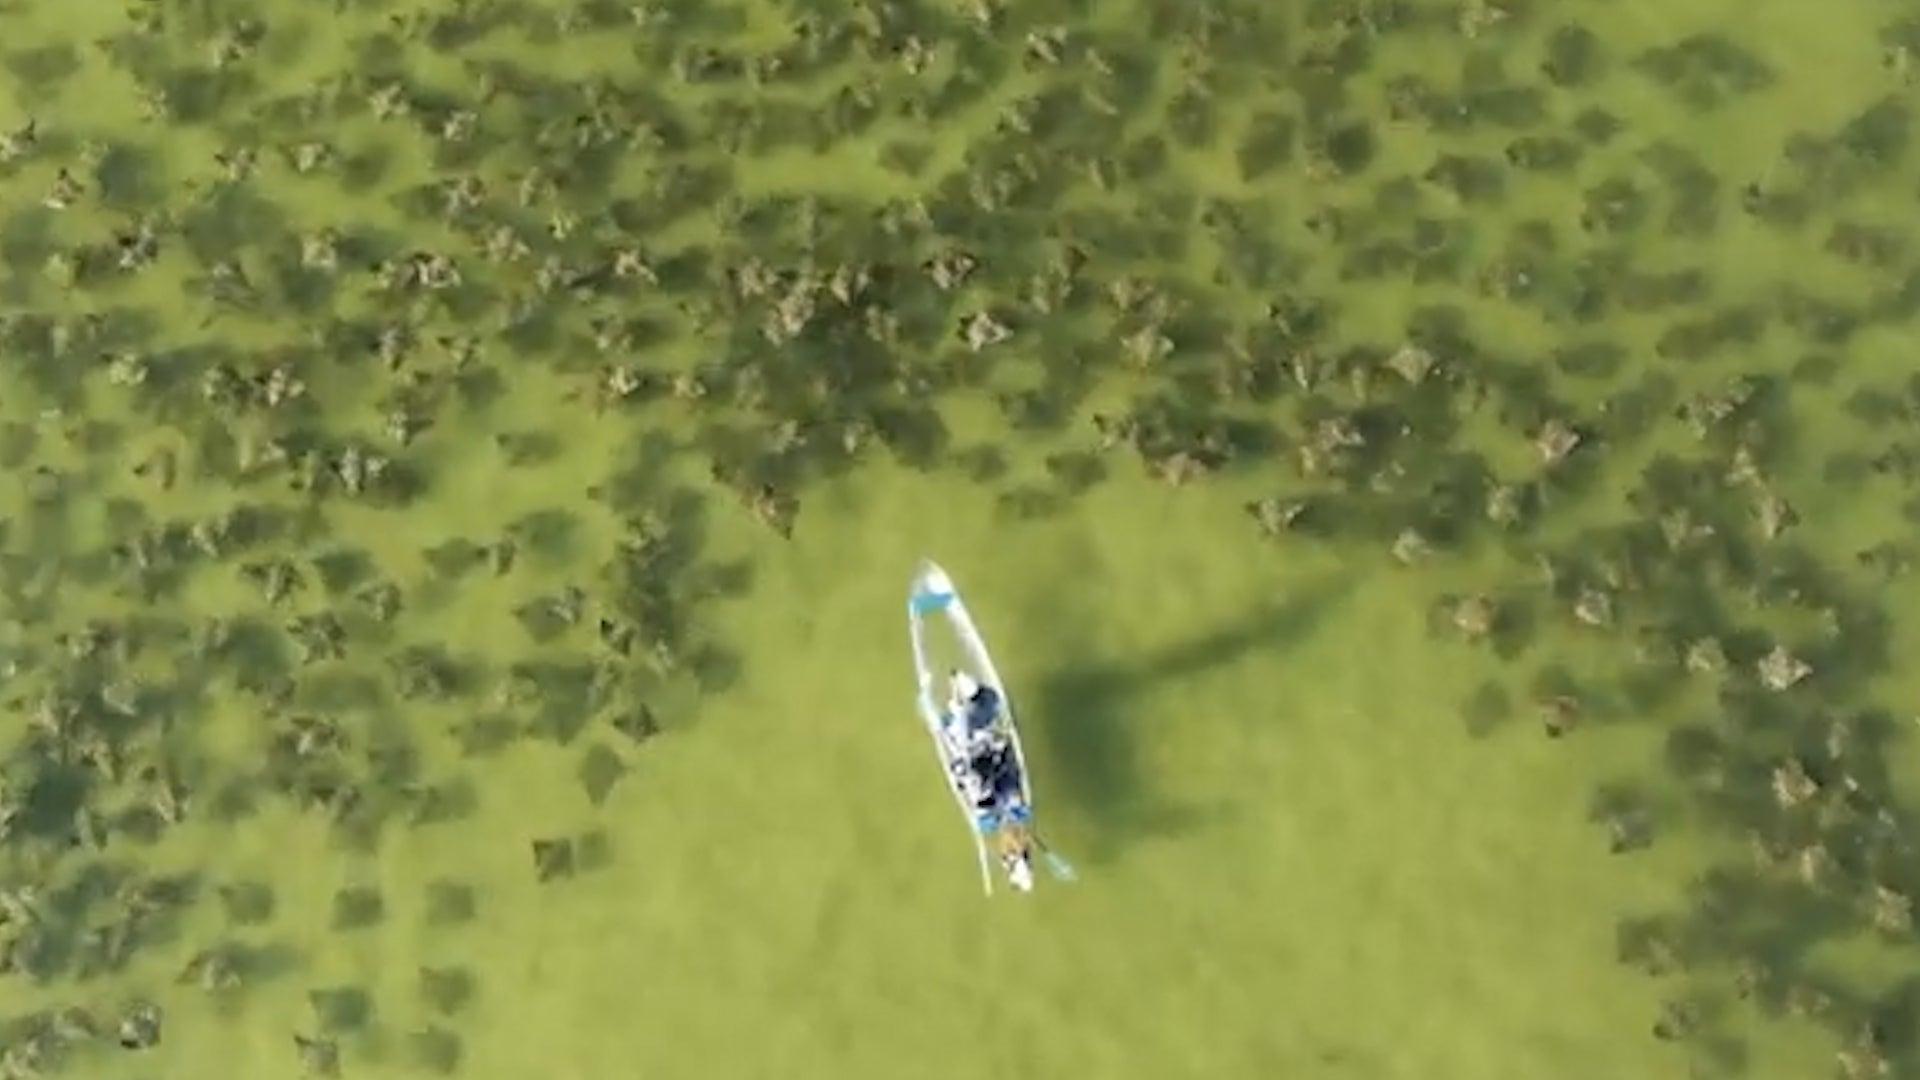 Florida Kayaker Encounters Massive School of Cownose Rays